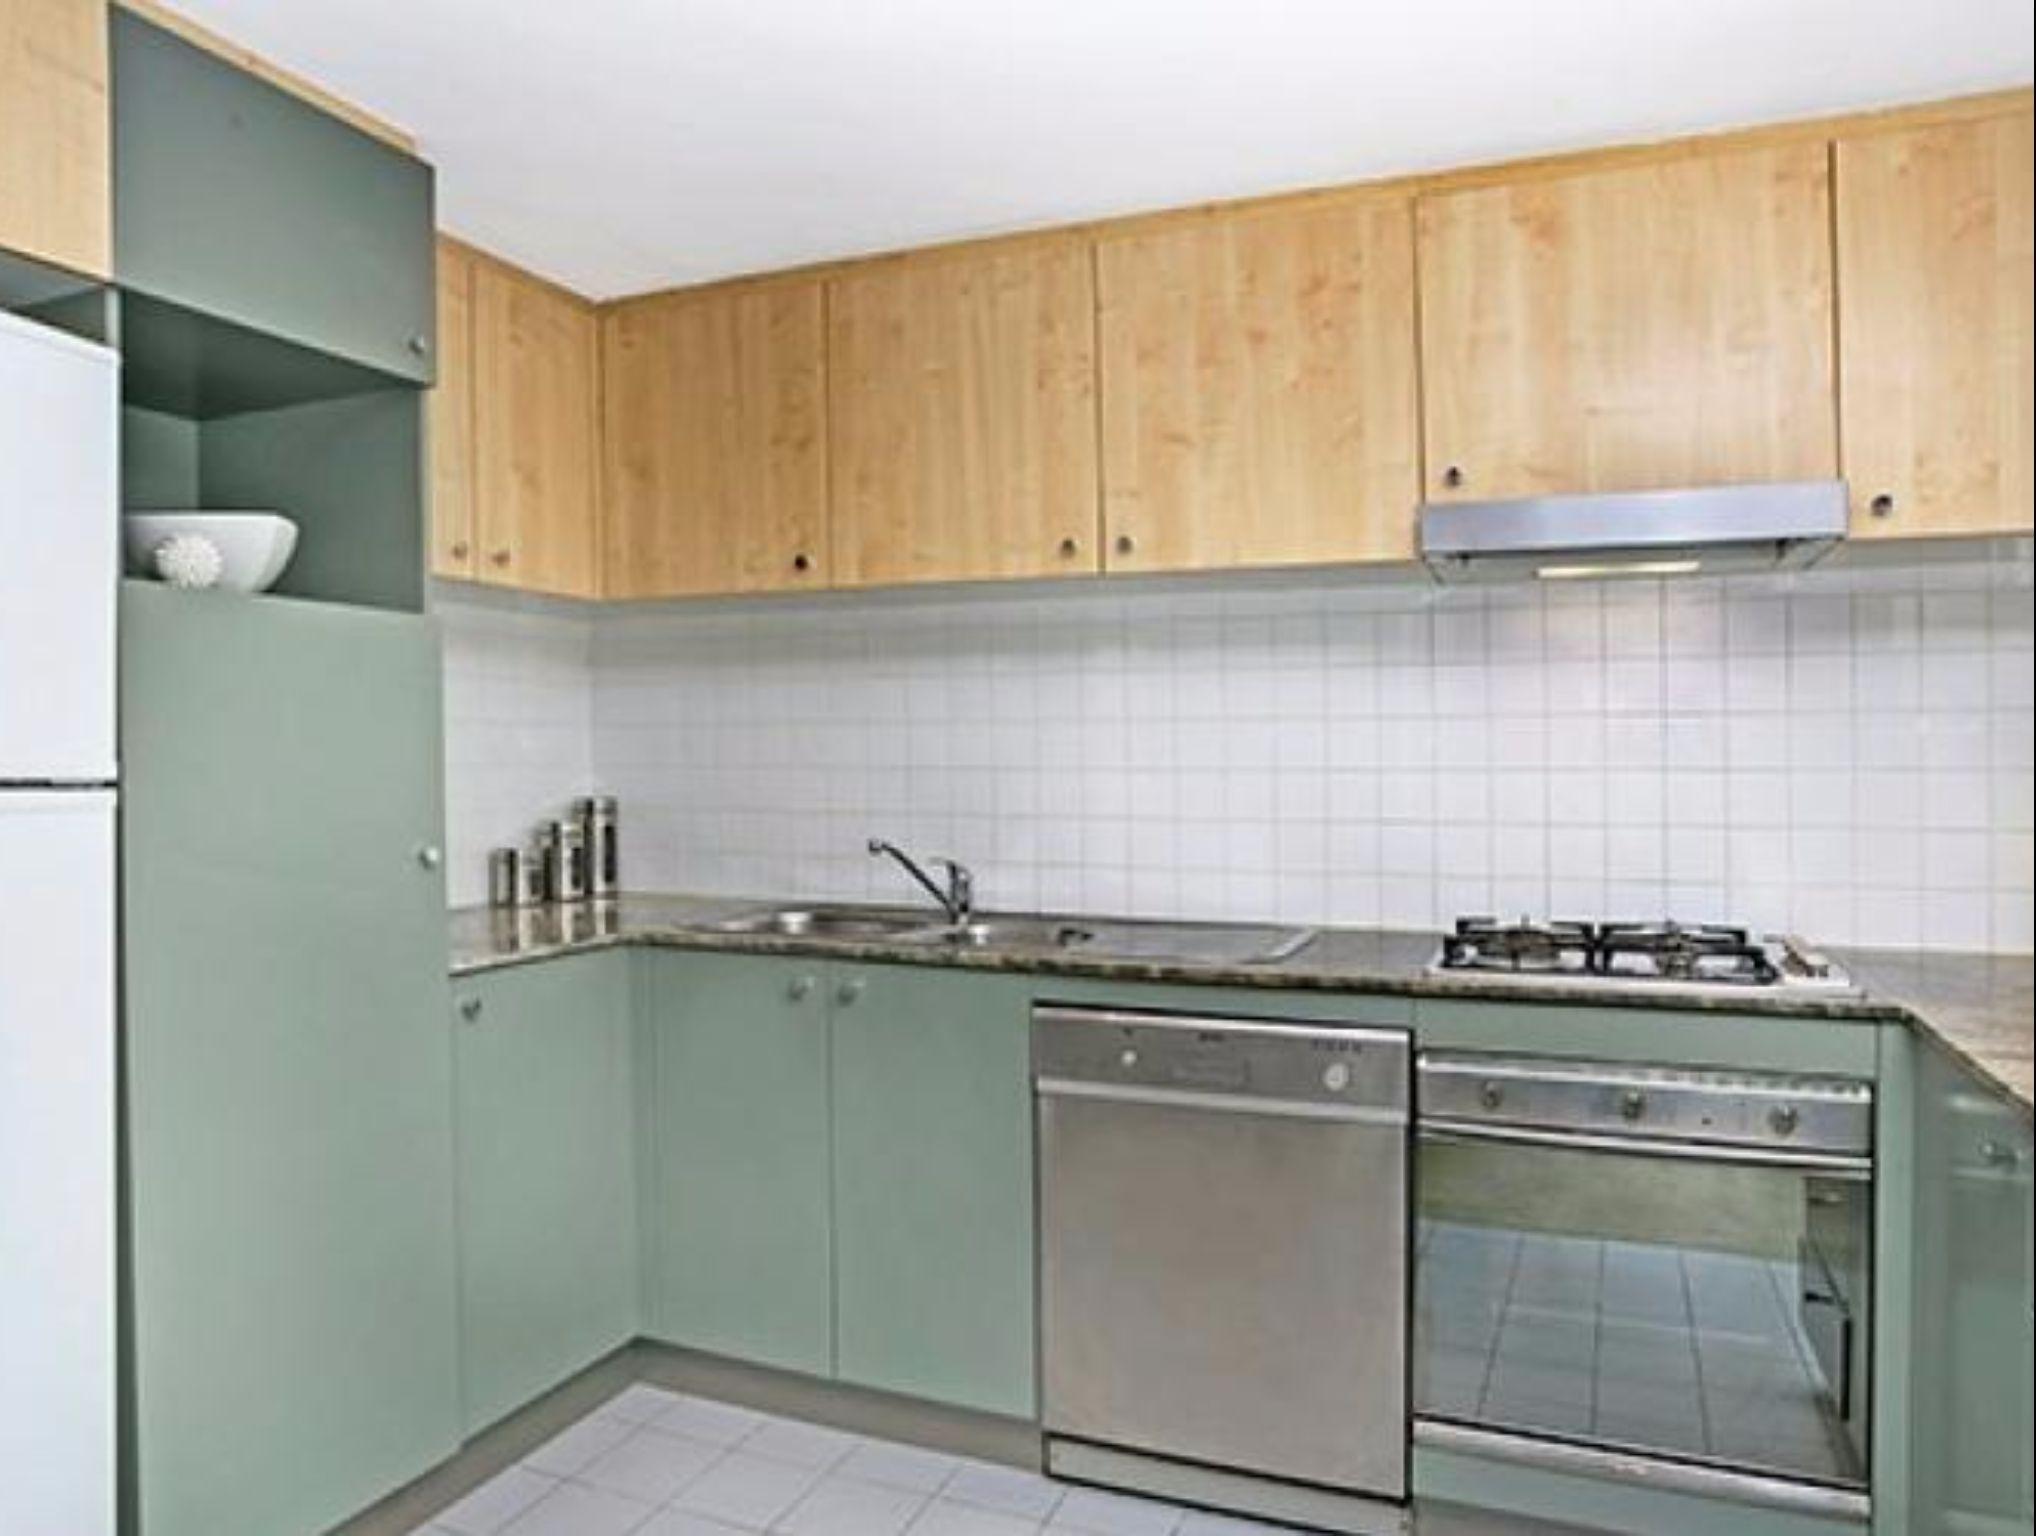 HELP1    Help St Apartment